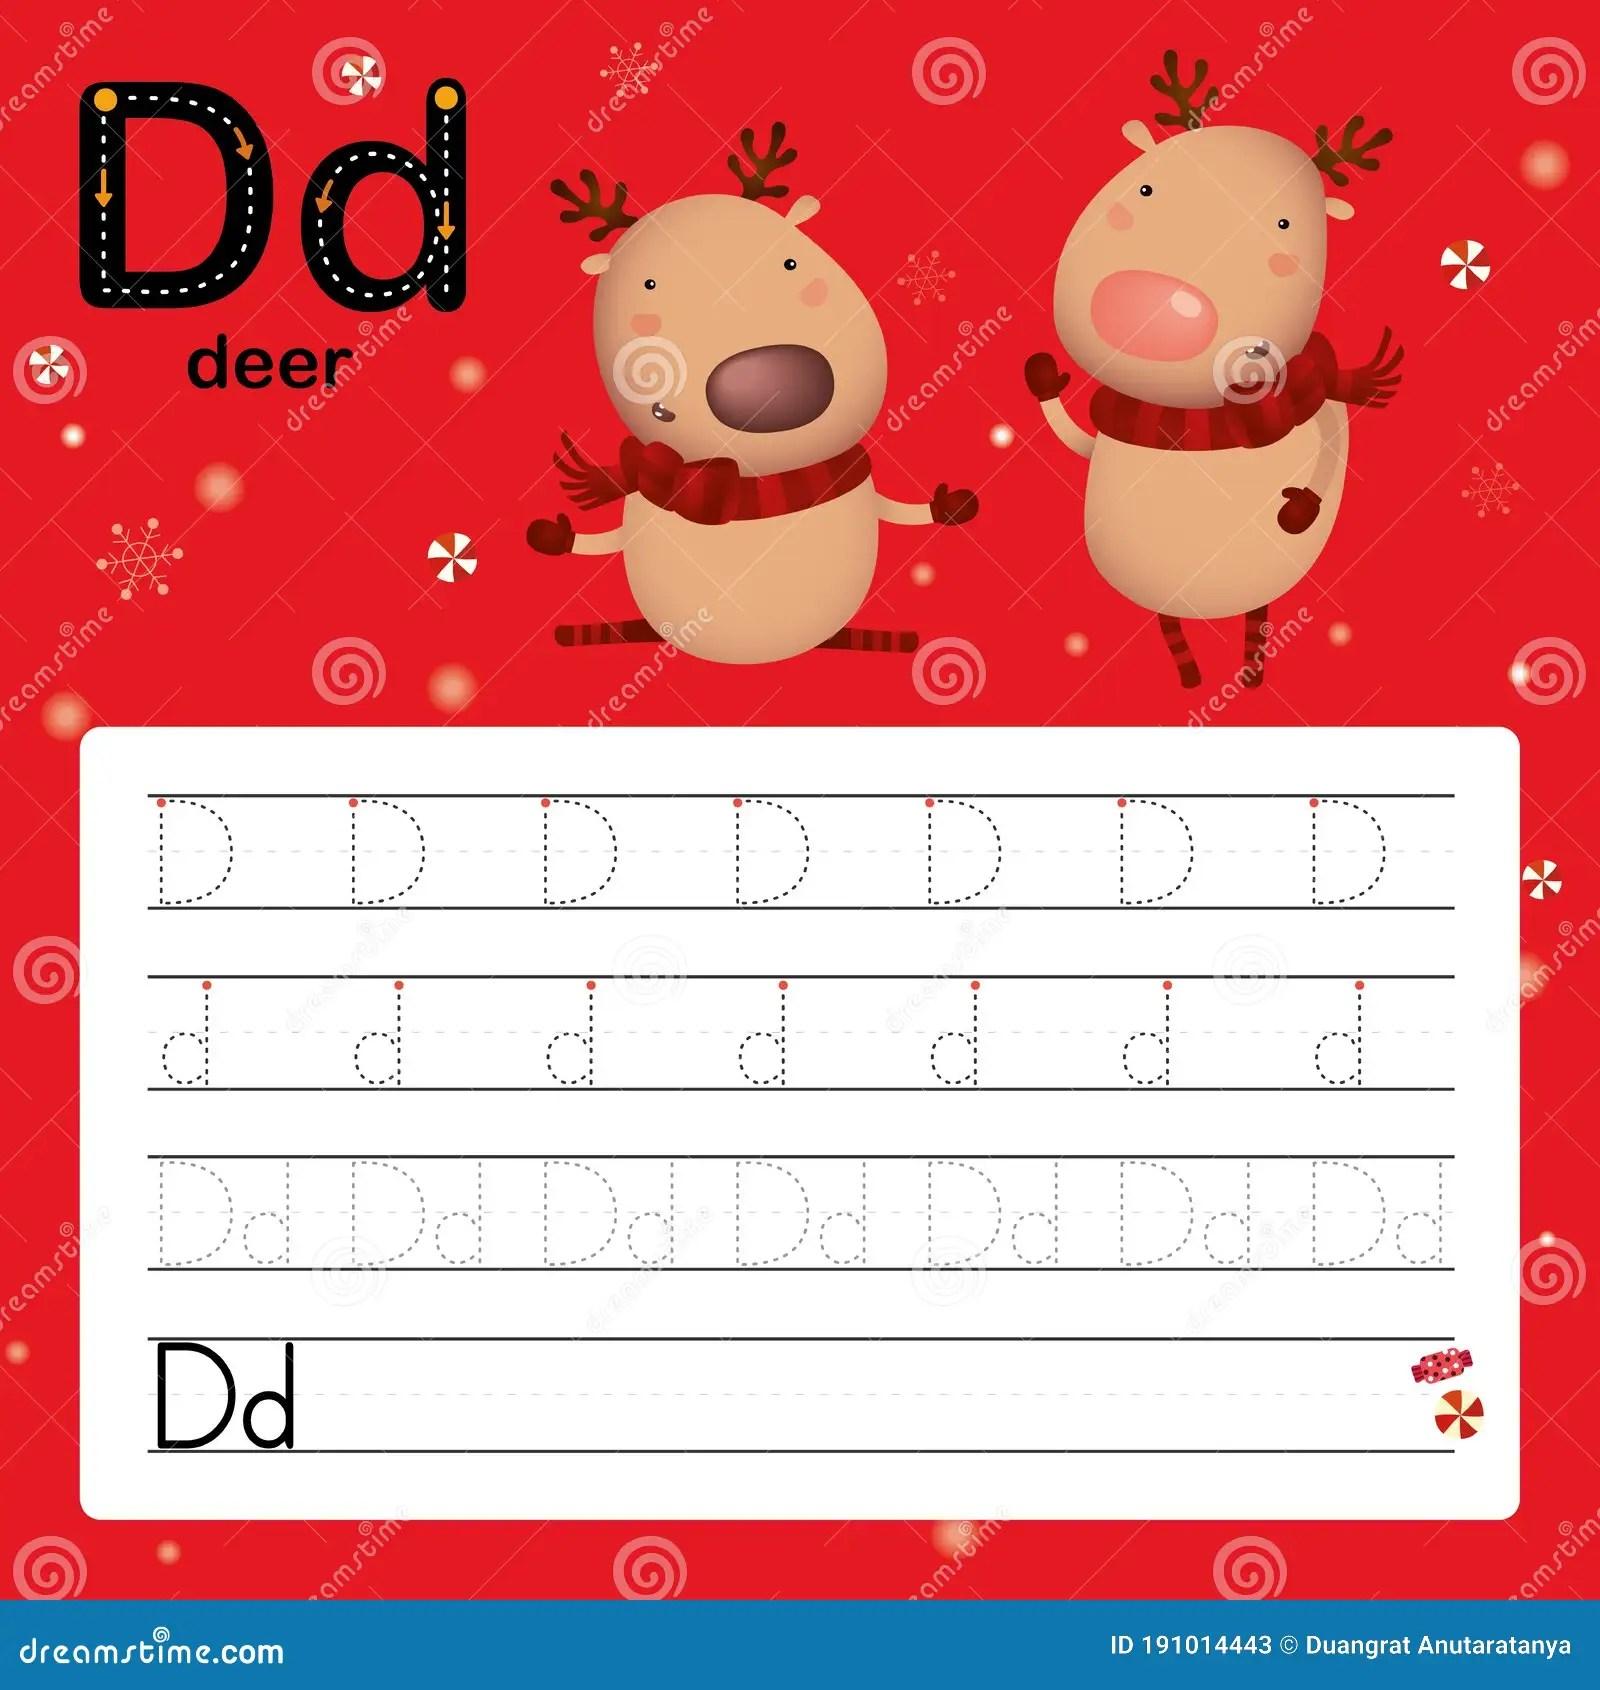 D Deer Alphabet Tracing Worksheet For Preschool And